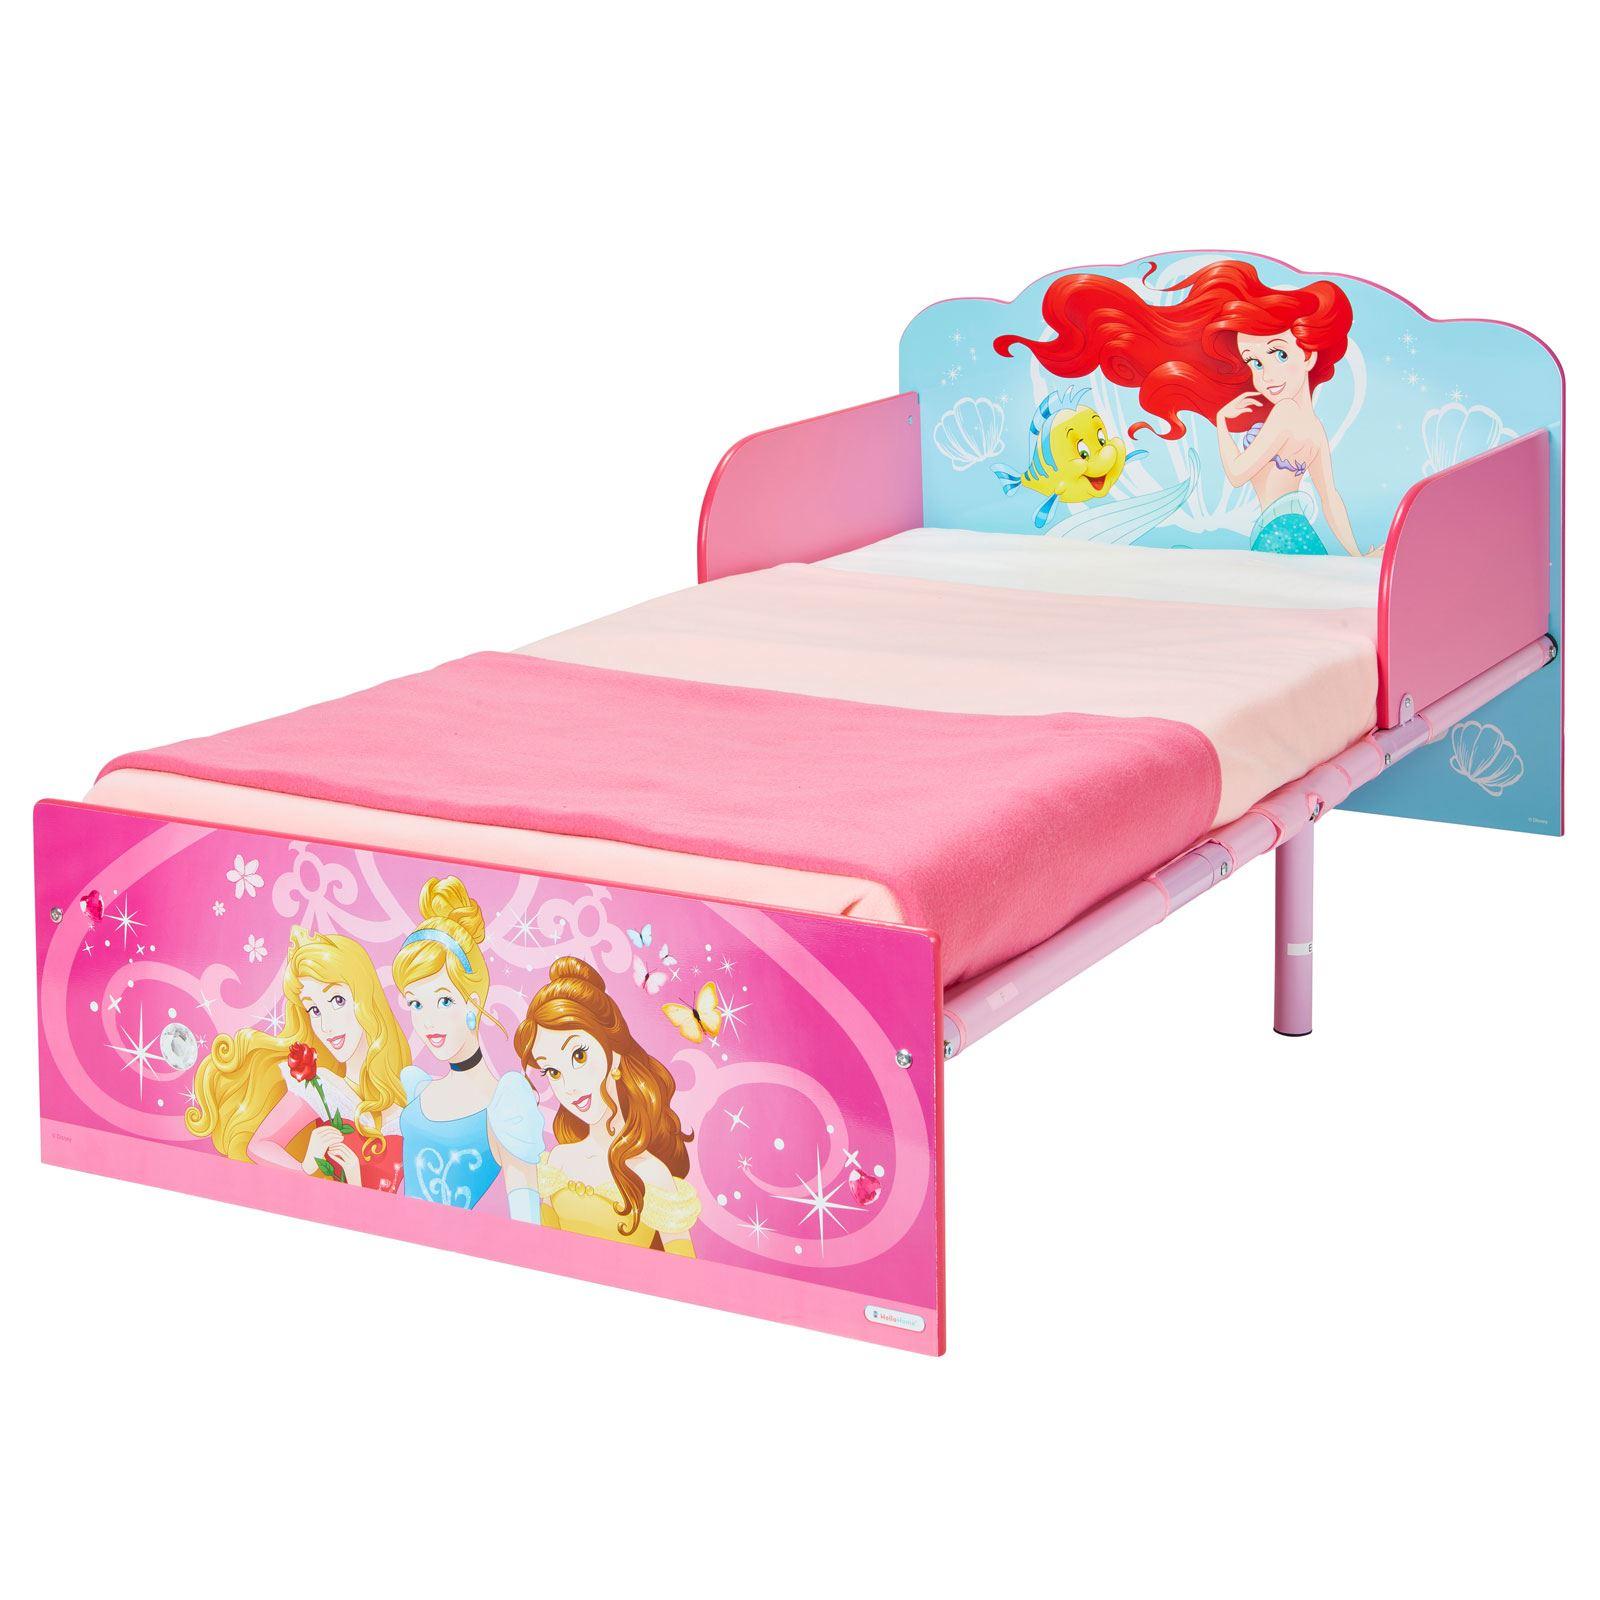 miniatura 17 - KIDS CHARACTER TODDLER BEDS - BOYS GIRLS BEDROOM DISNEY